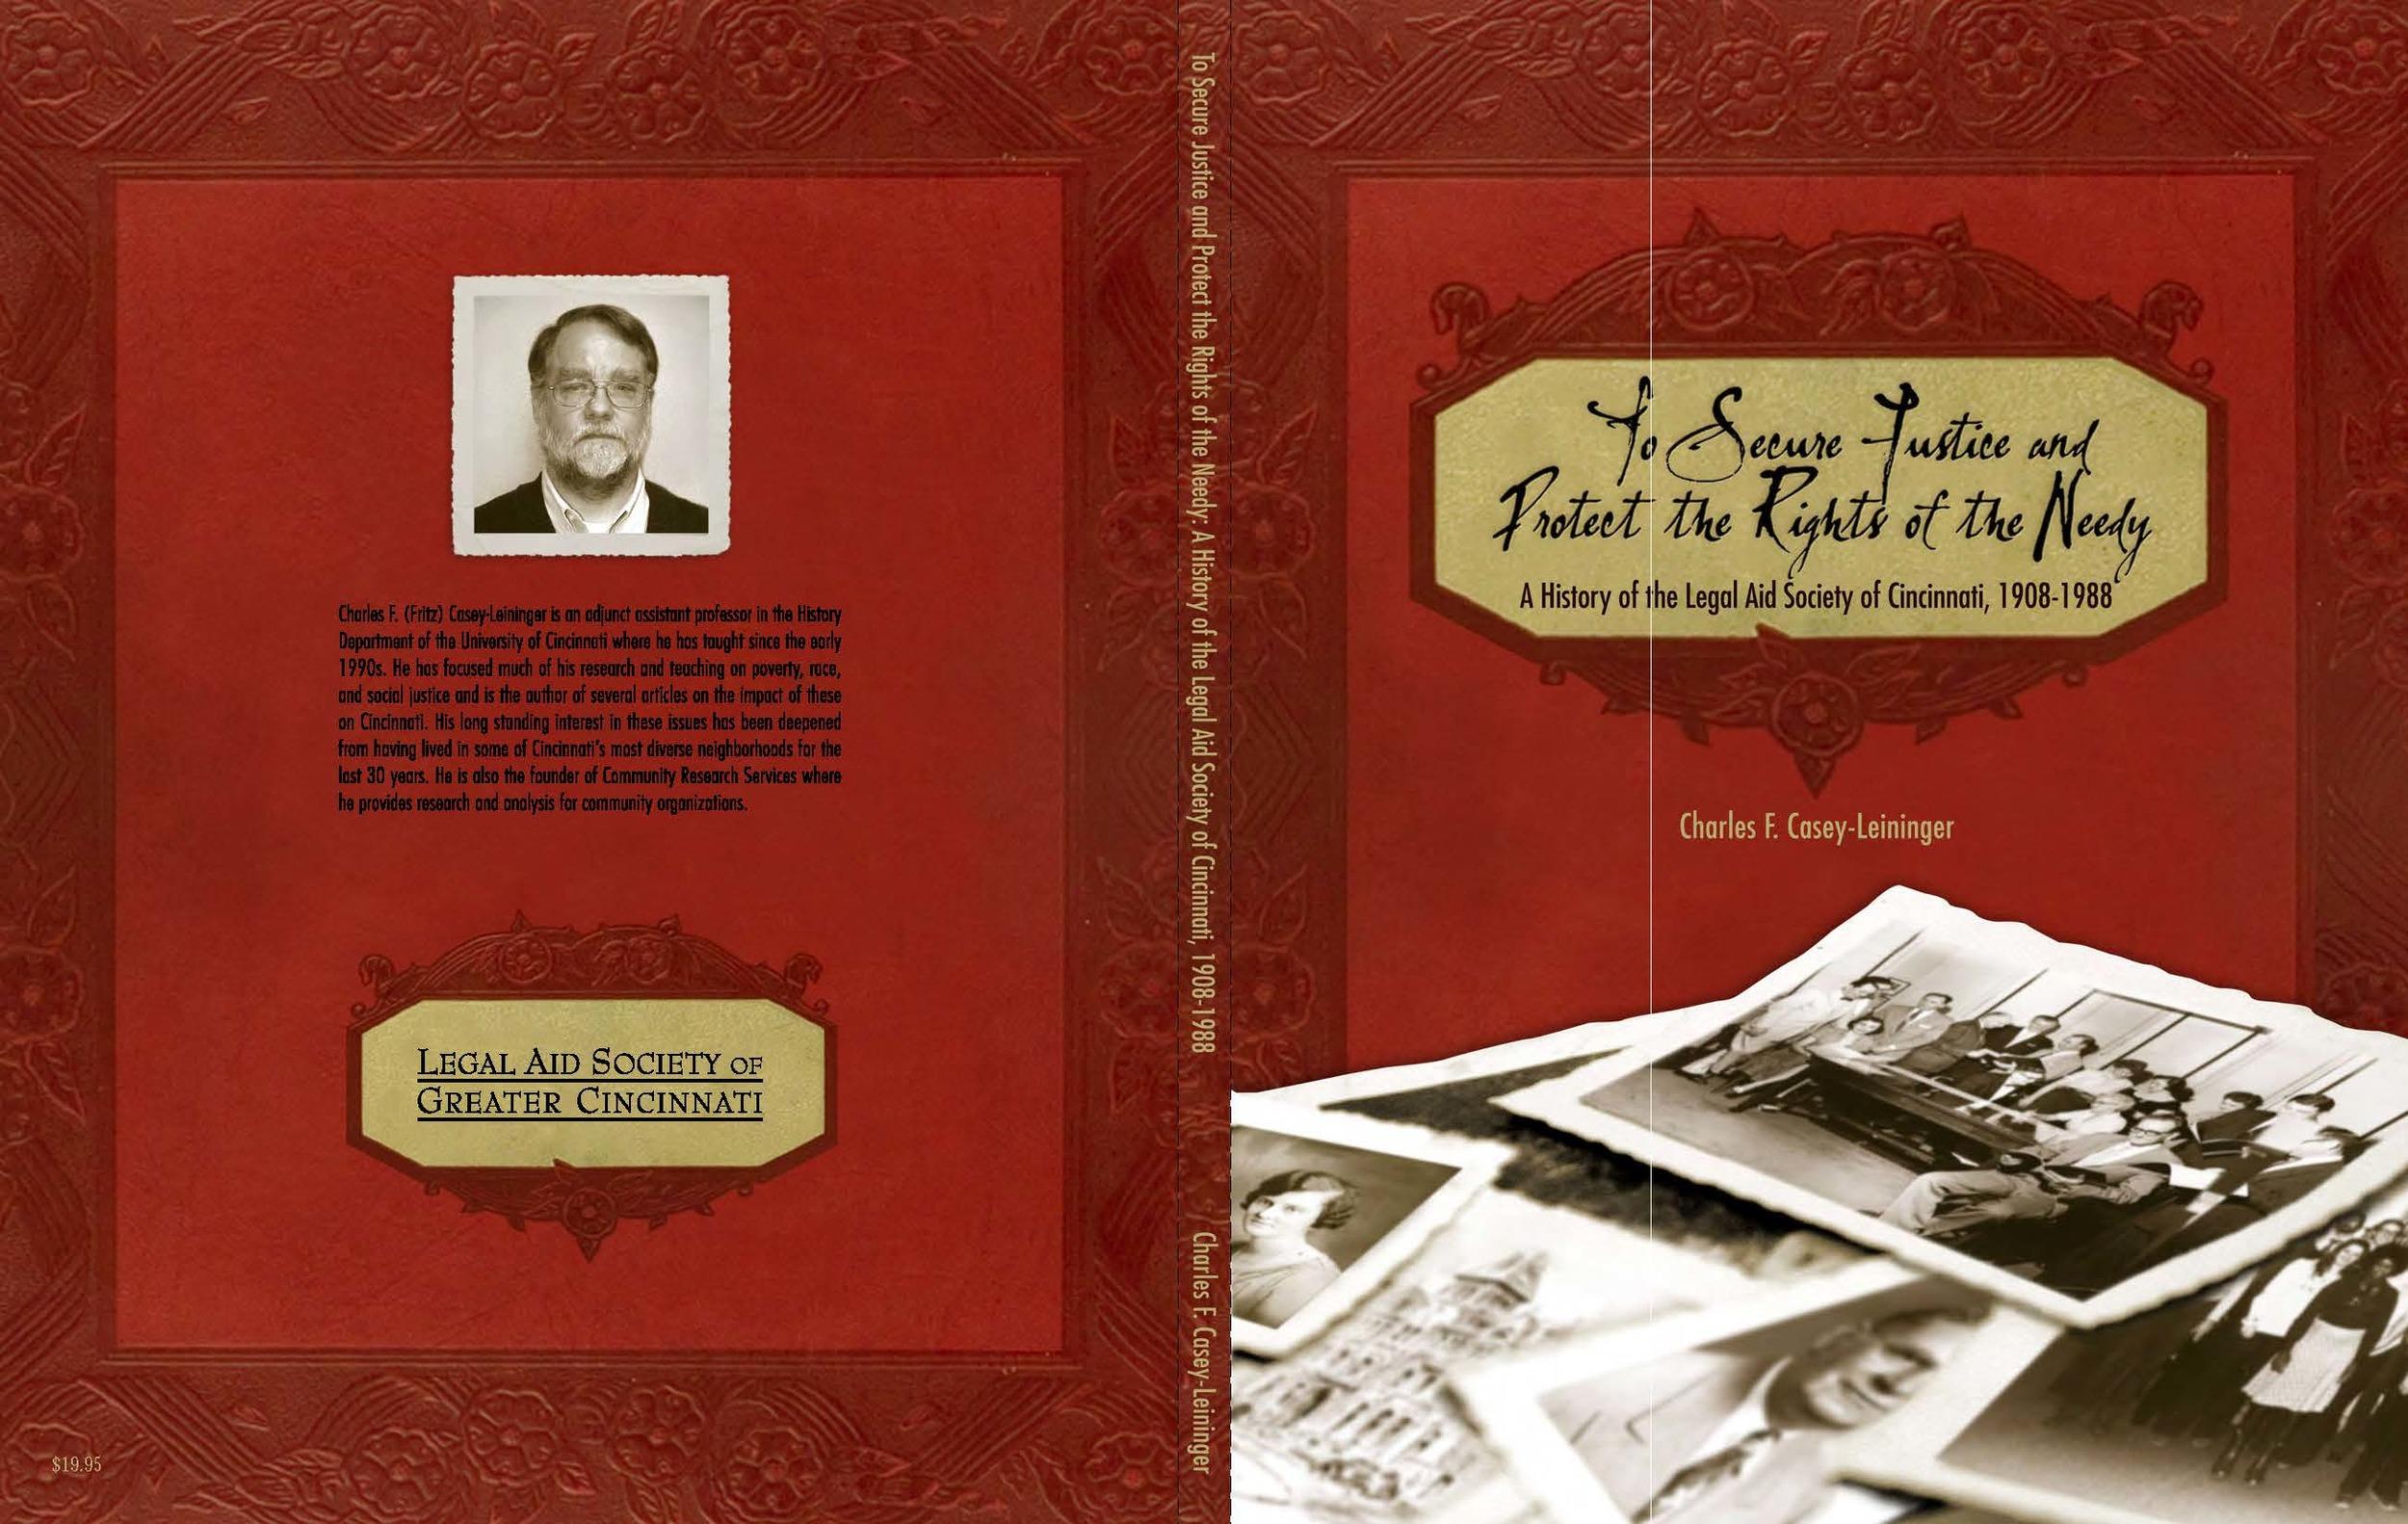 Cover LAS_HistoryBook_Full_QCP1 prepress (1).jpg